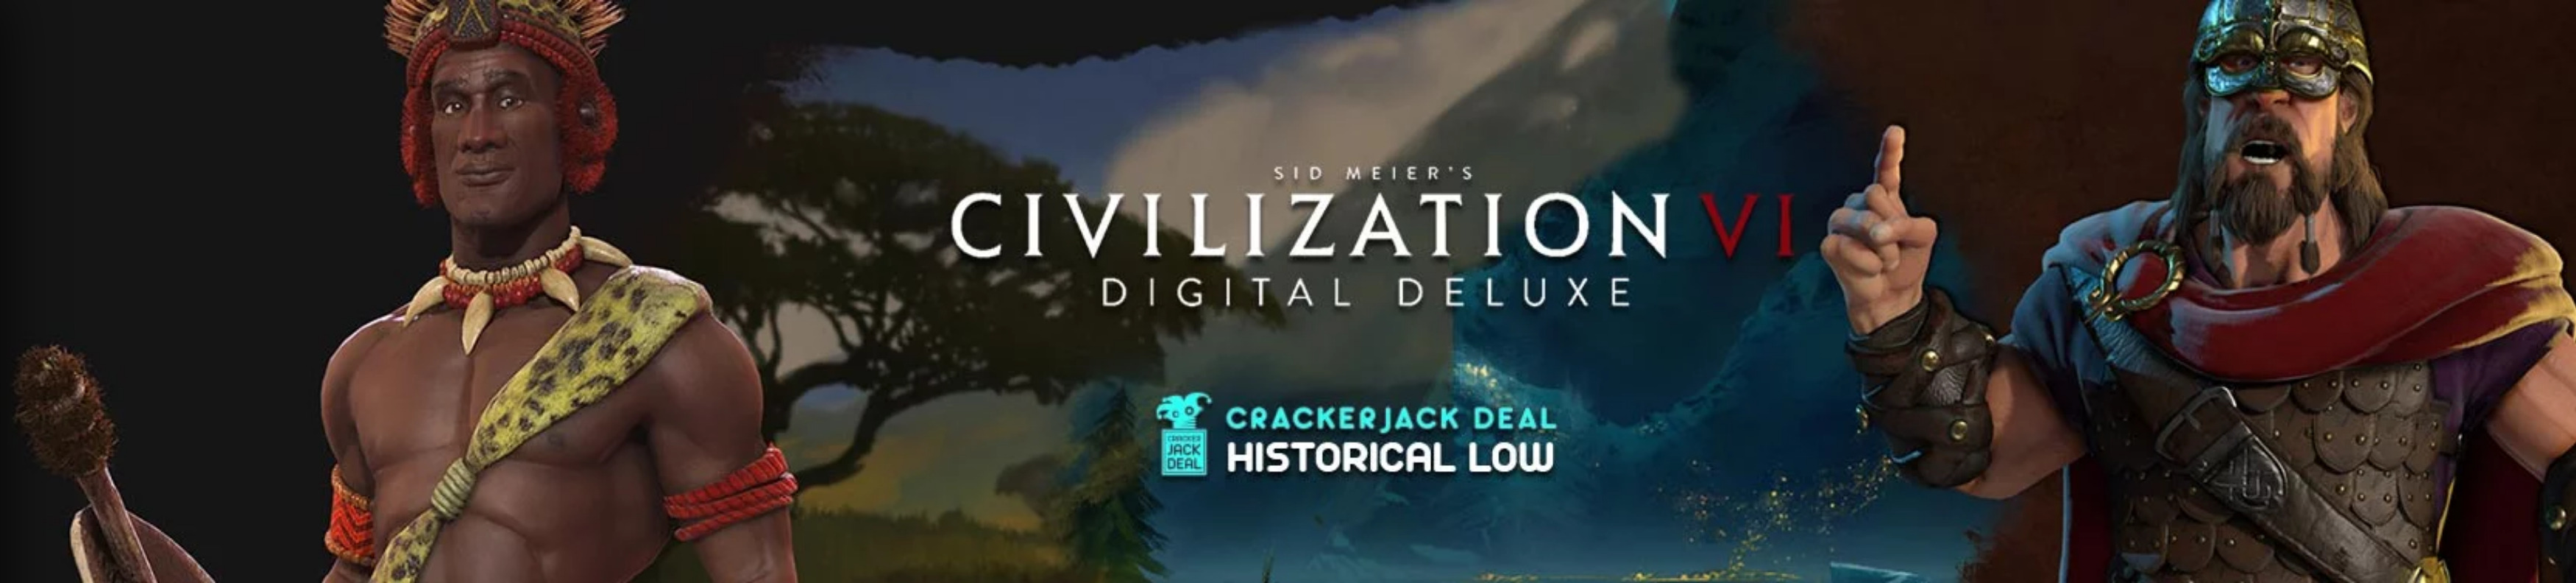 Screenshot_2019-10-03 Sid Meier's Civilization VI Digital Deluxe Edition at 81% OFF .jpg